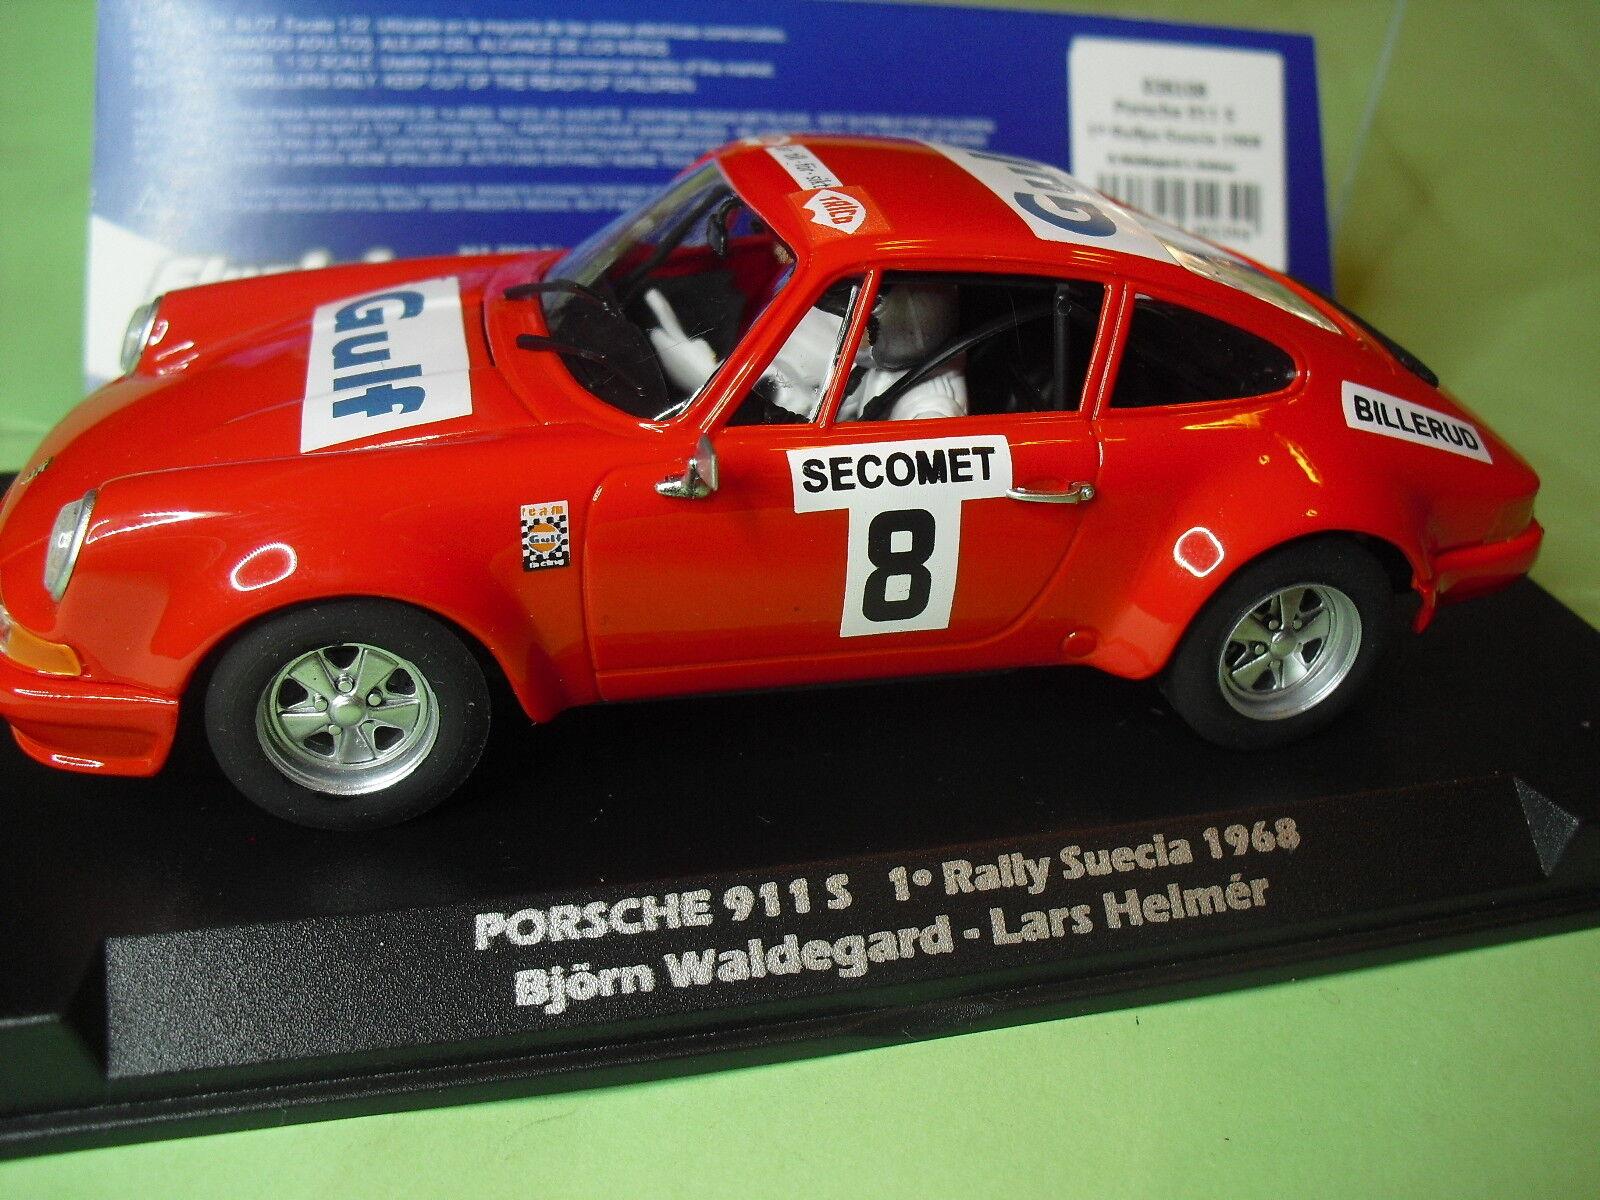 flygagaslot 036108 Porsche 911 rally Sverige 1968 - Gulf Ny